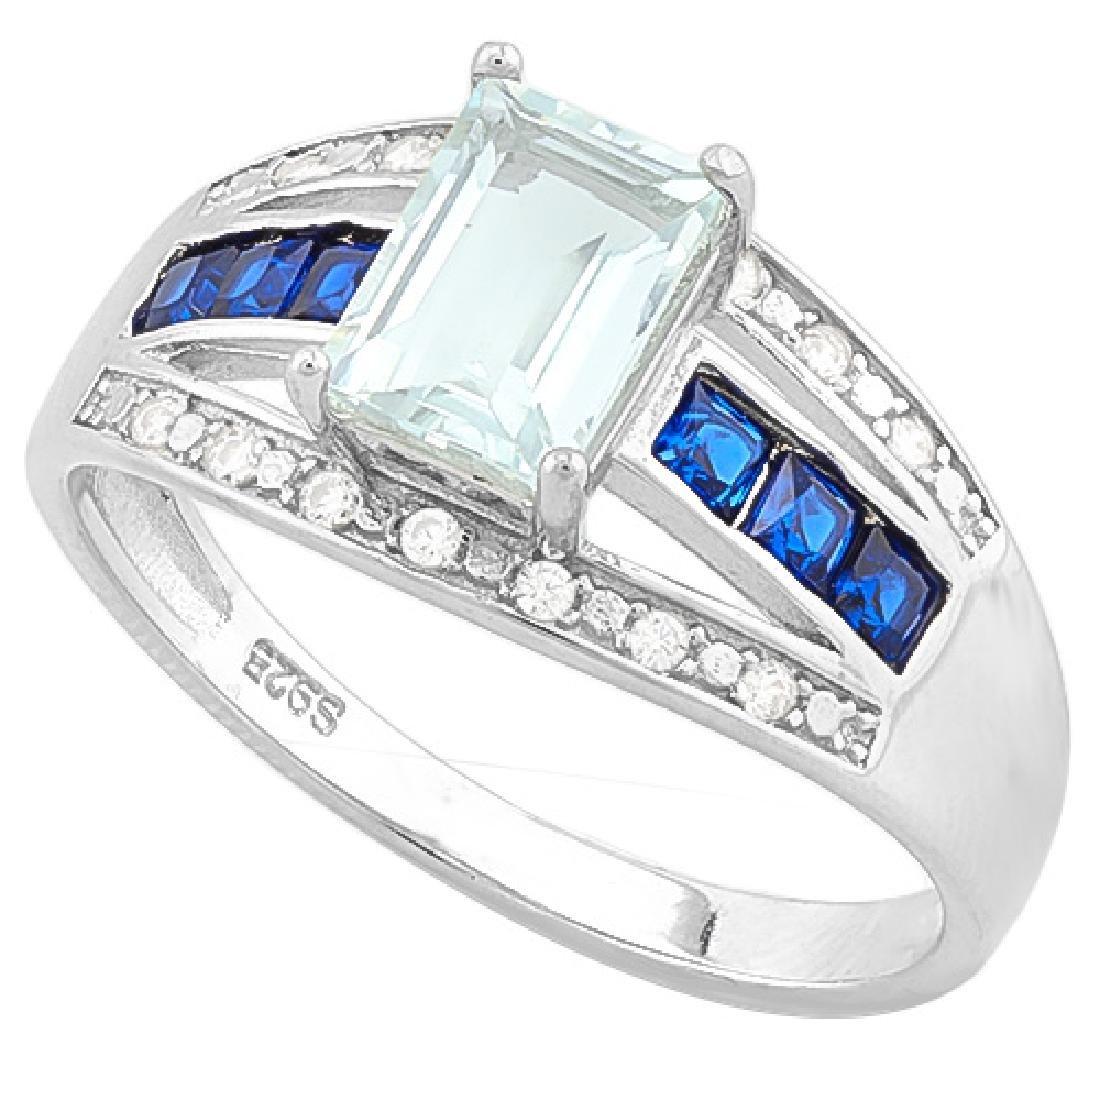 AQUAMARINE & (38 PCS) FLAWLESS CREATED DIAMOND 925 STER